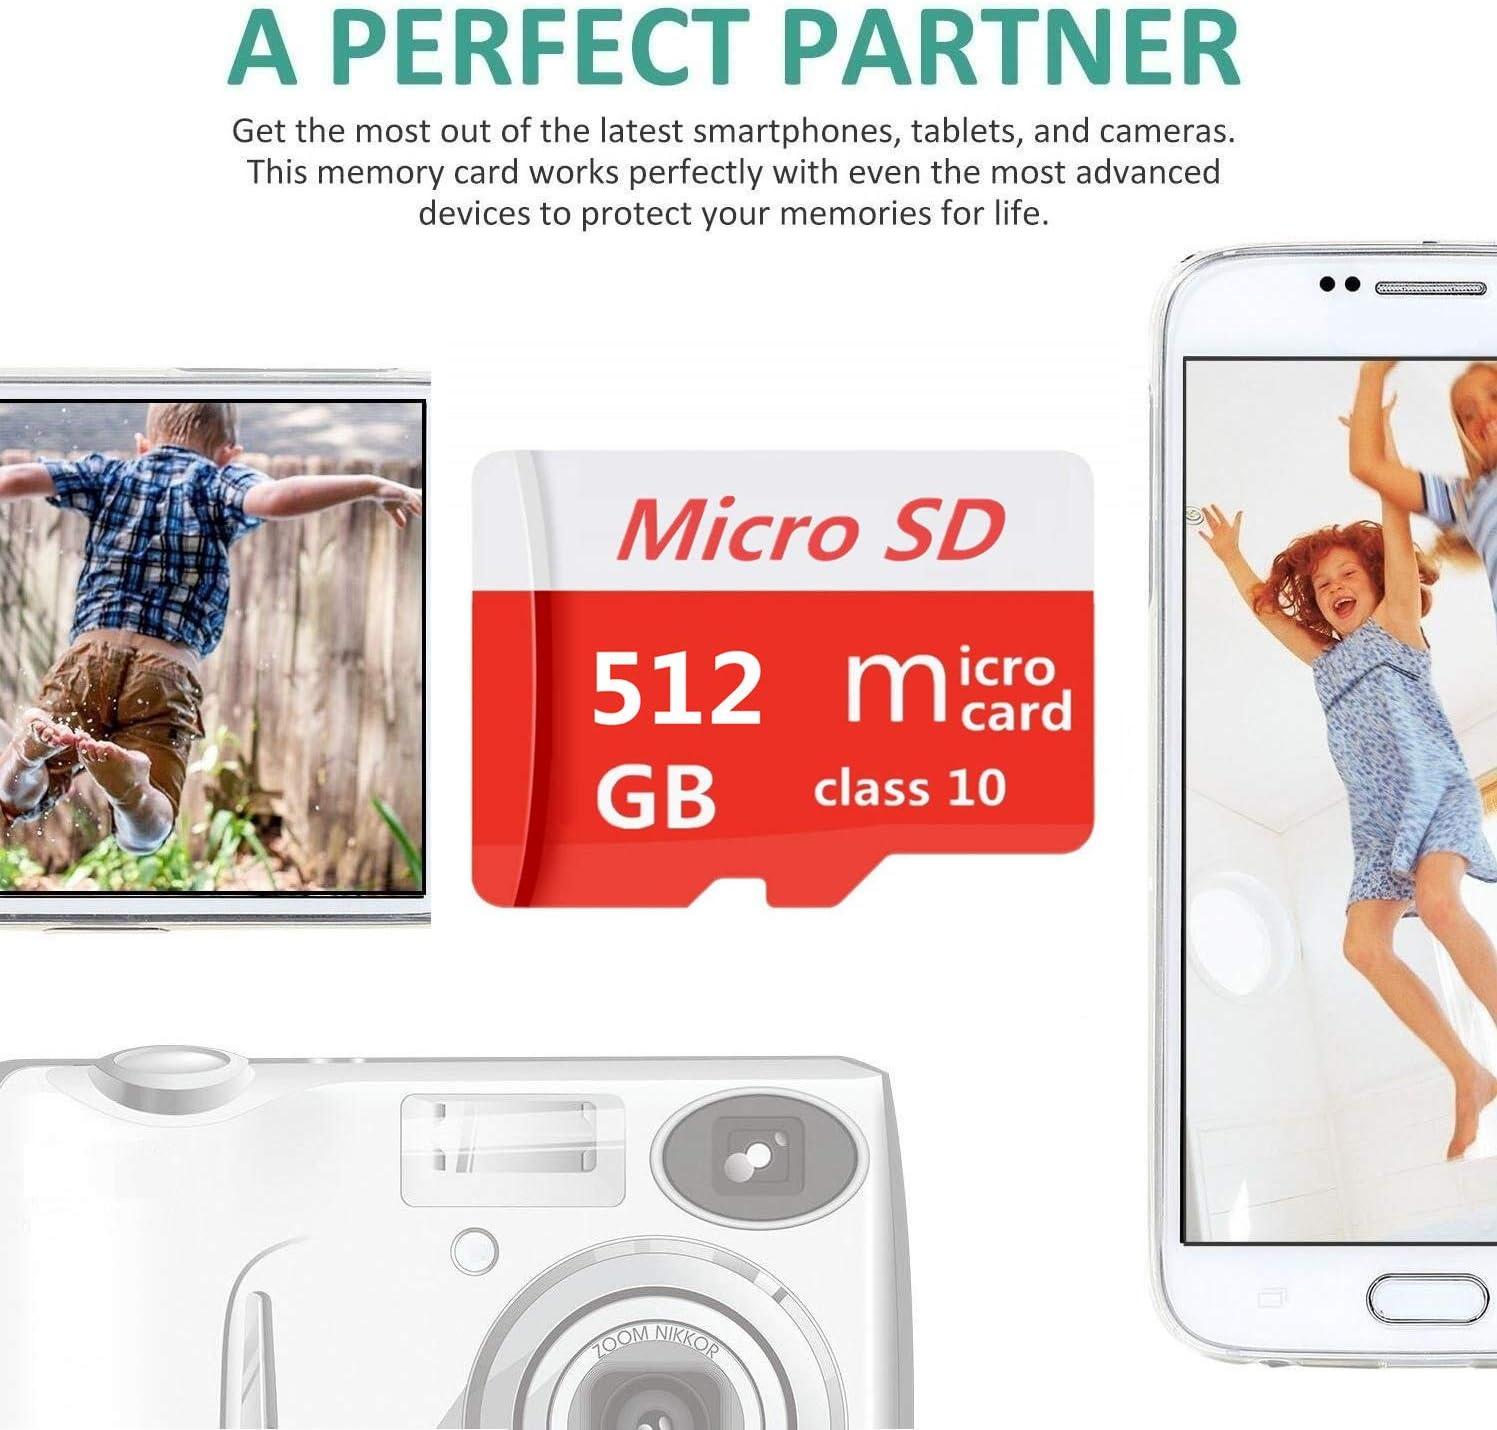 Tarjeta Micro SD 256 GB, 512 GB, 1024 GB, clase 10, micro SD, SDXC, incluye adaptador incluido 1024GB Genericce